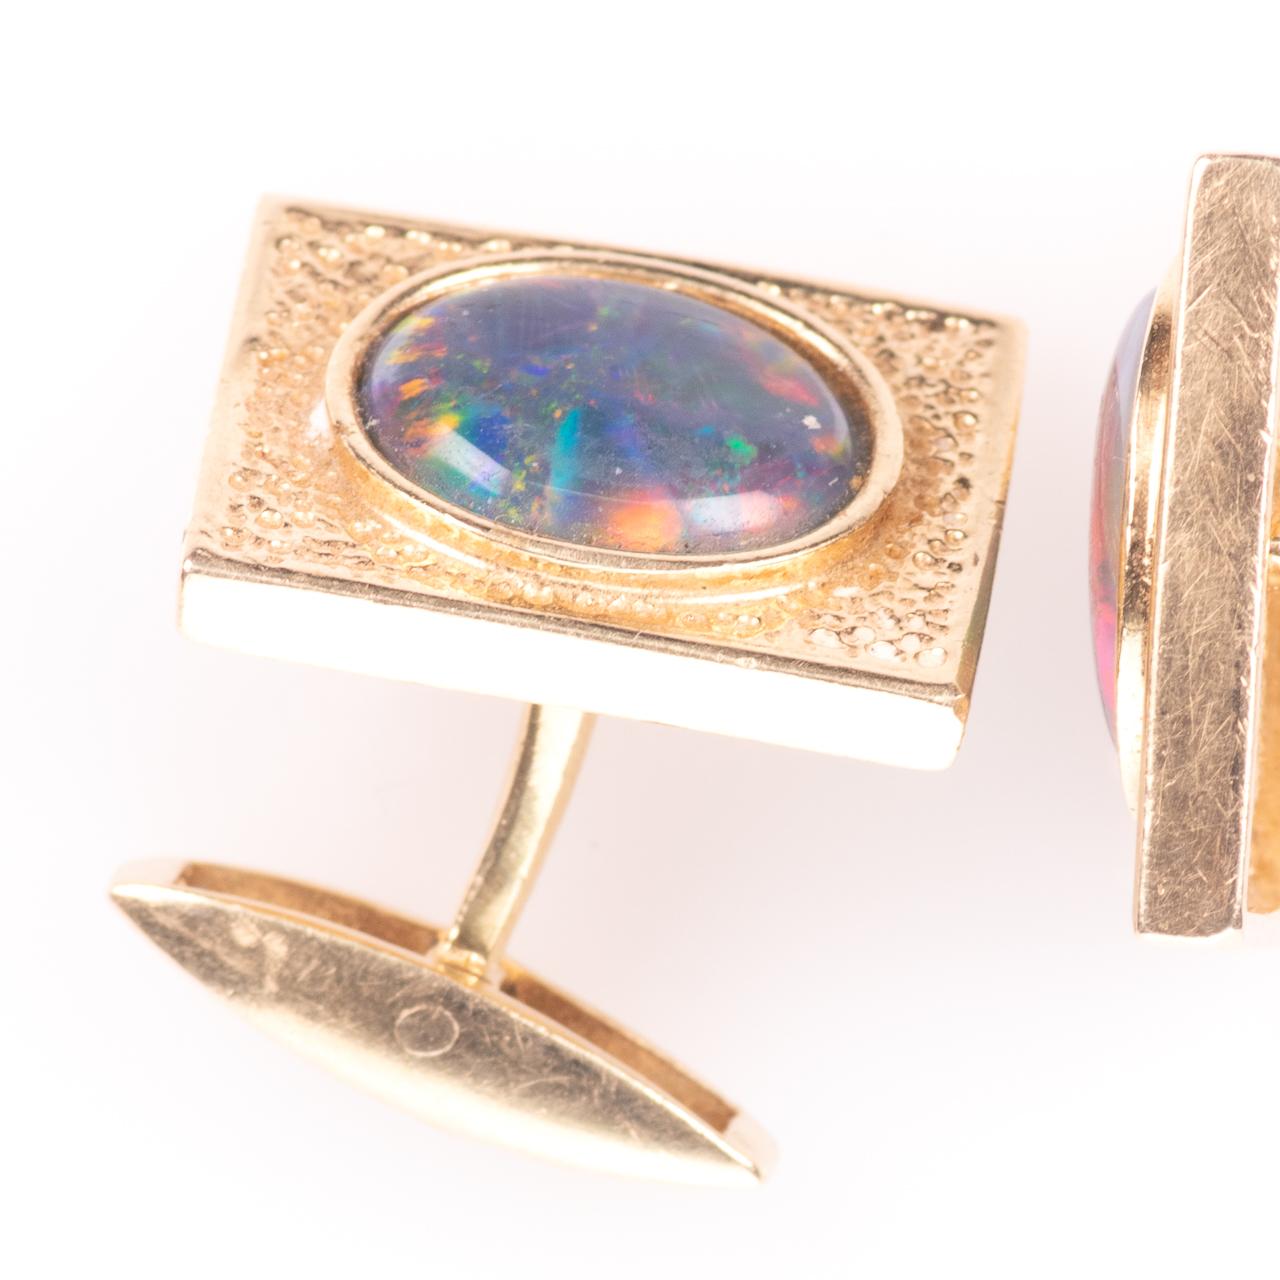 14ct Gold Gentleman's Black Lightning Opal Cufflinks - Image 6 of 6